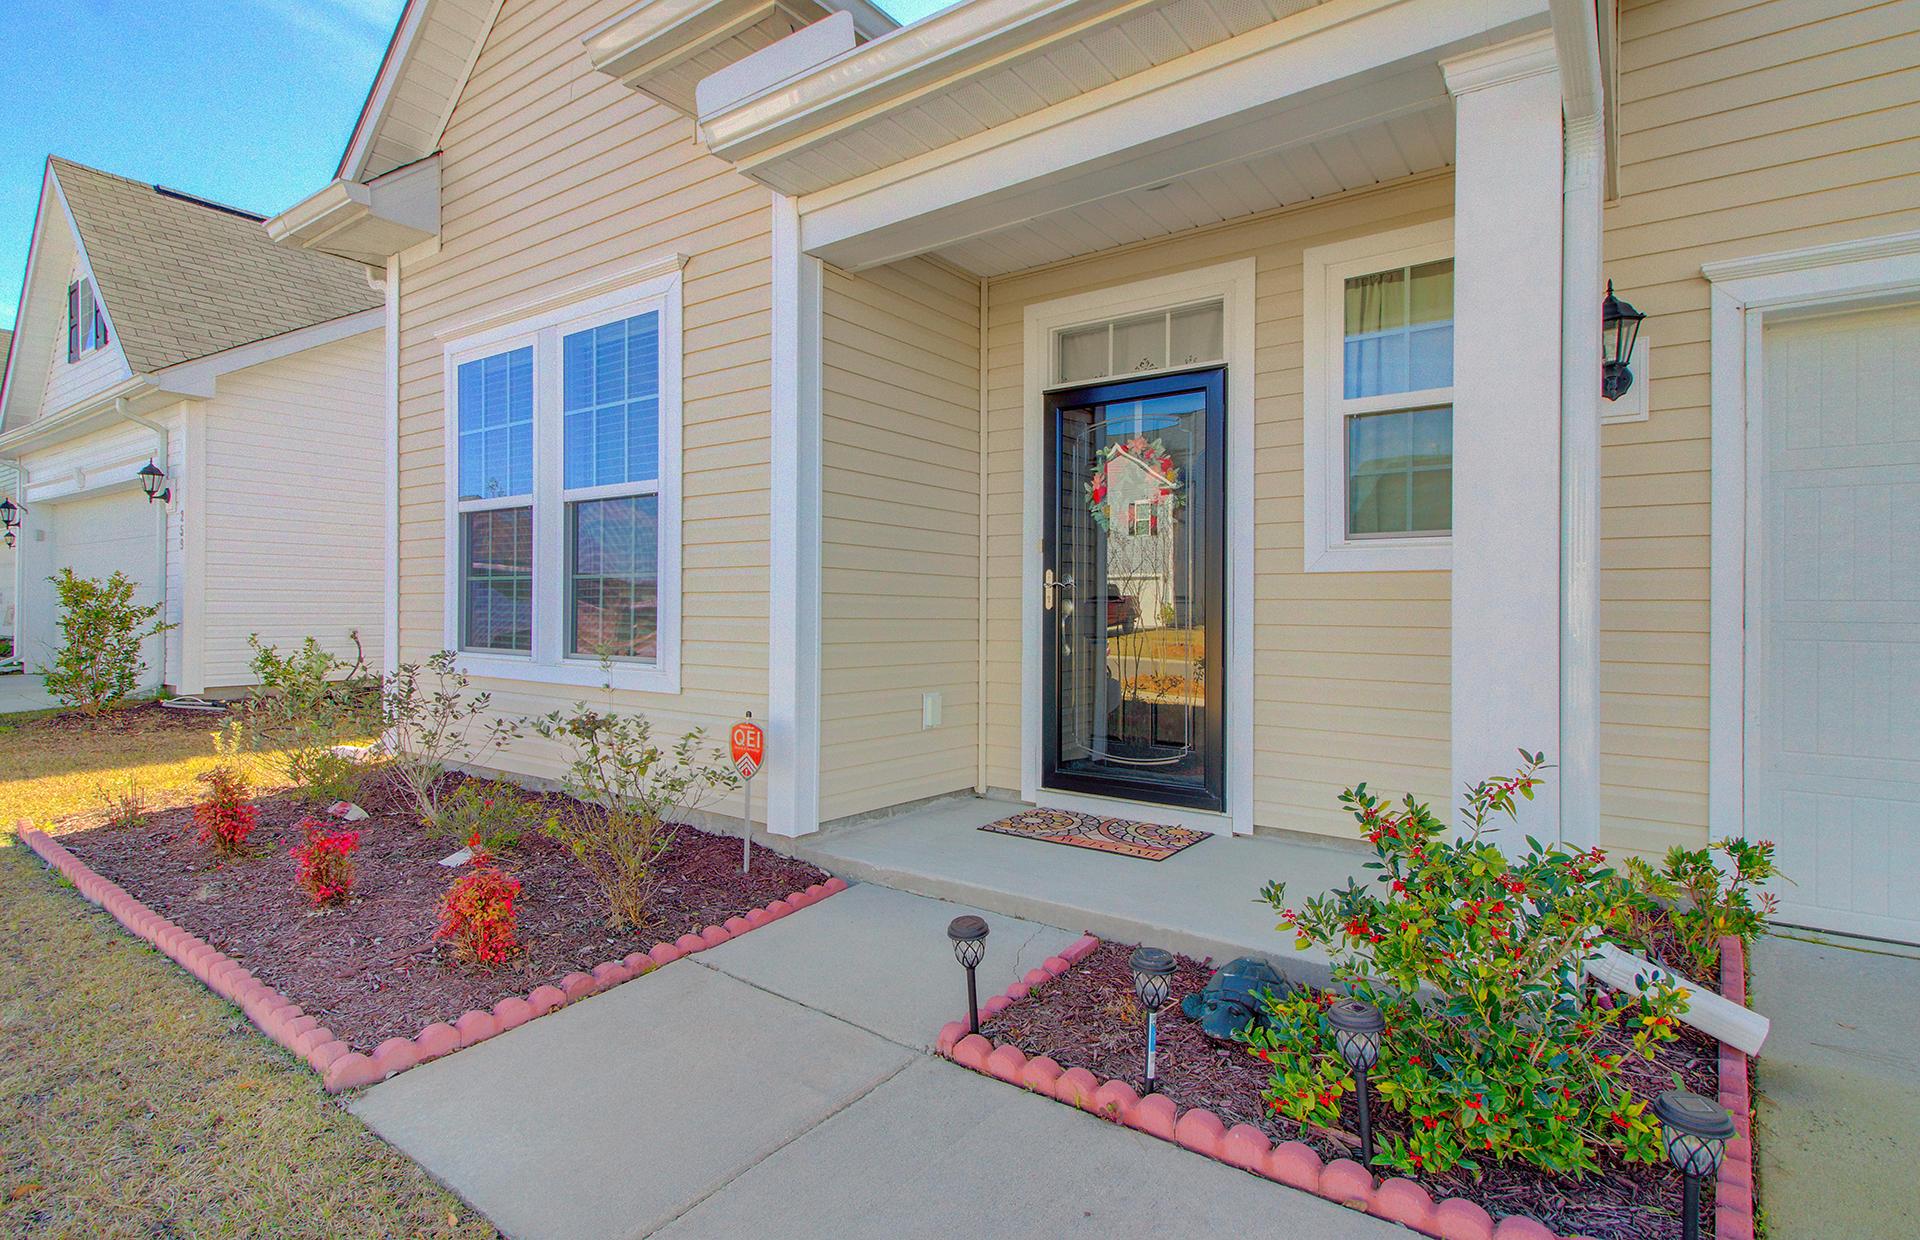 Cane Bay Plantation Homes For Sale - 255 Spectrum, Summerville, SC - 3